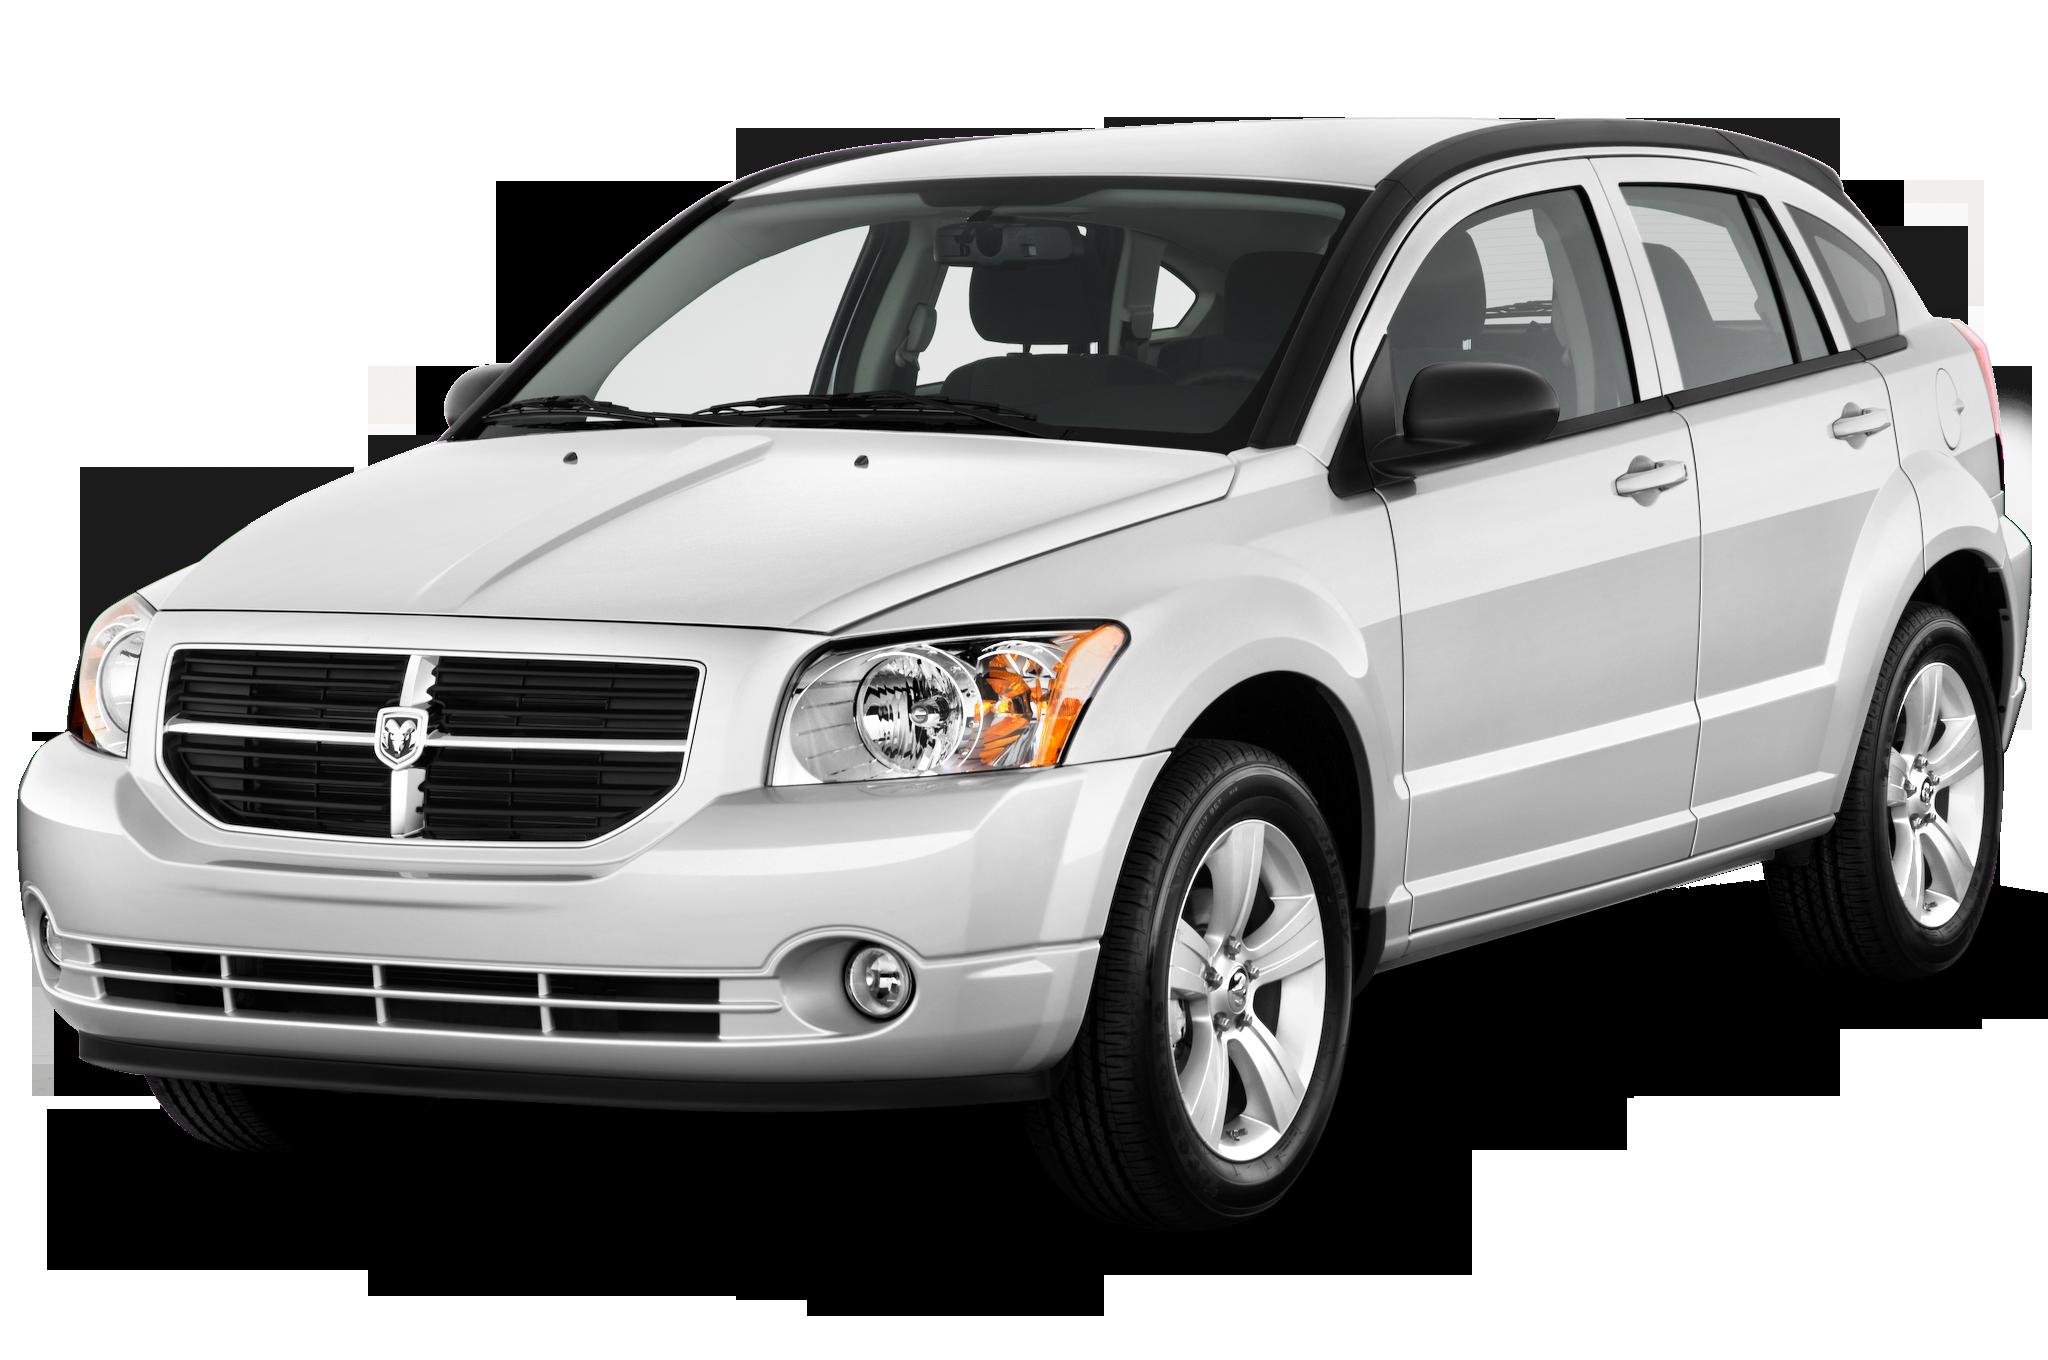 Dodge Caliber Sxt Wagon Angular Front on 2010 Dodge Caliber Rush